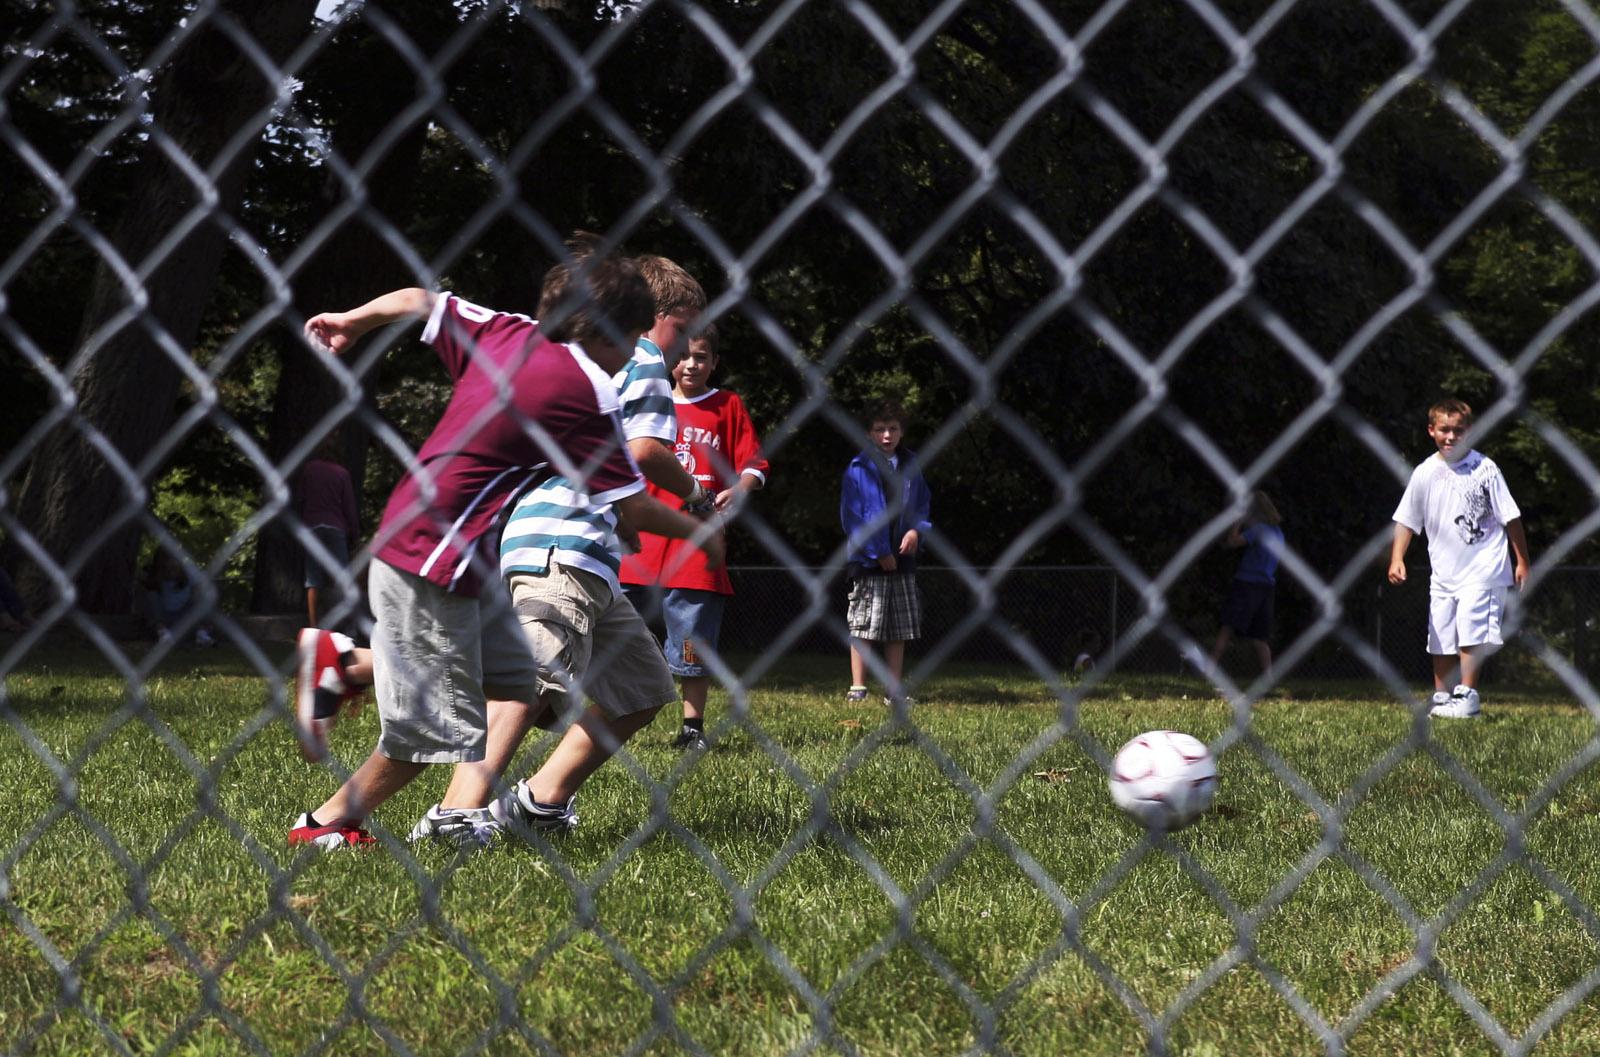 Virginia mulls more recess for grade schoolers